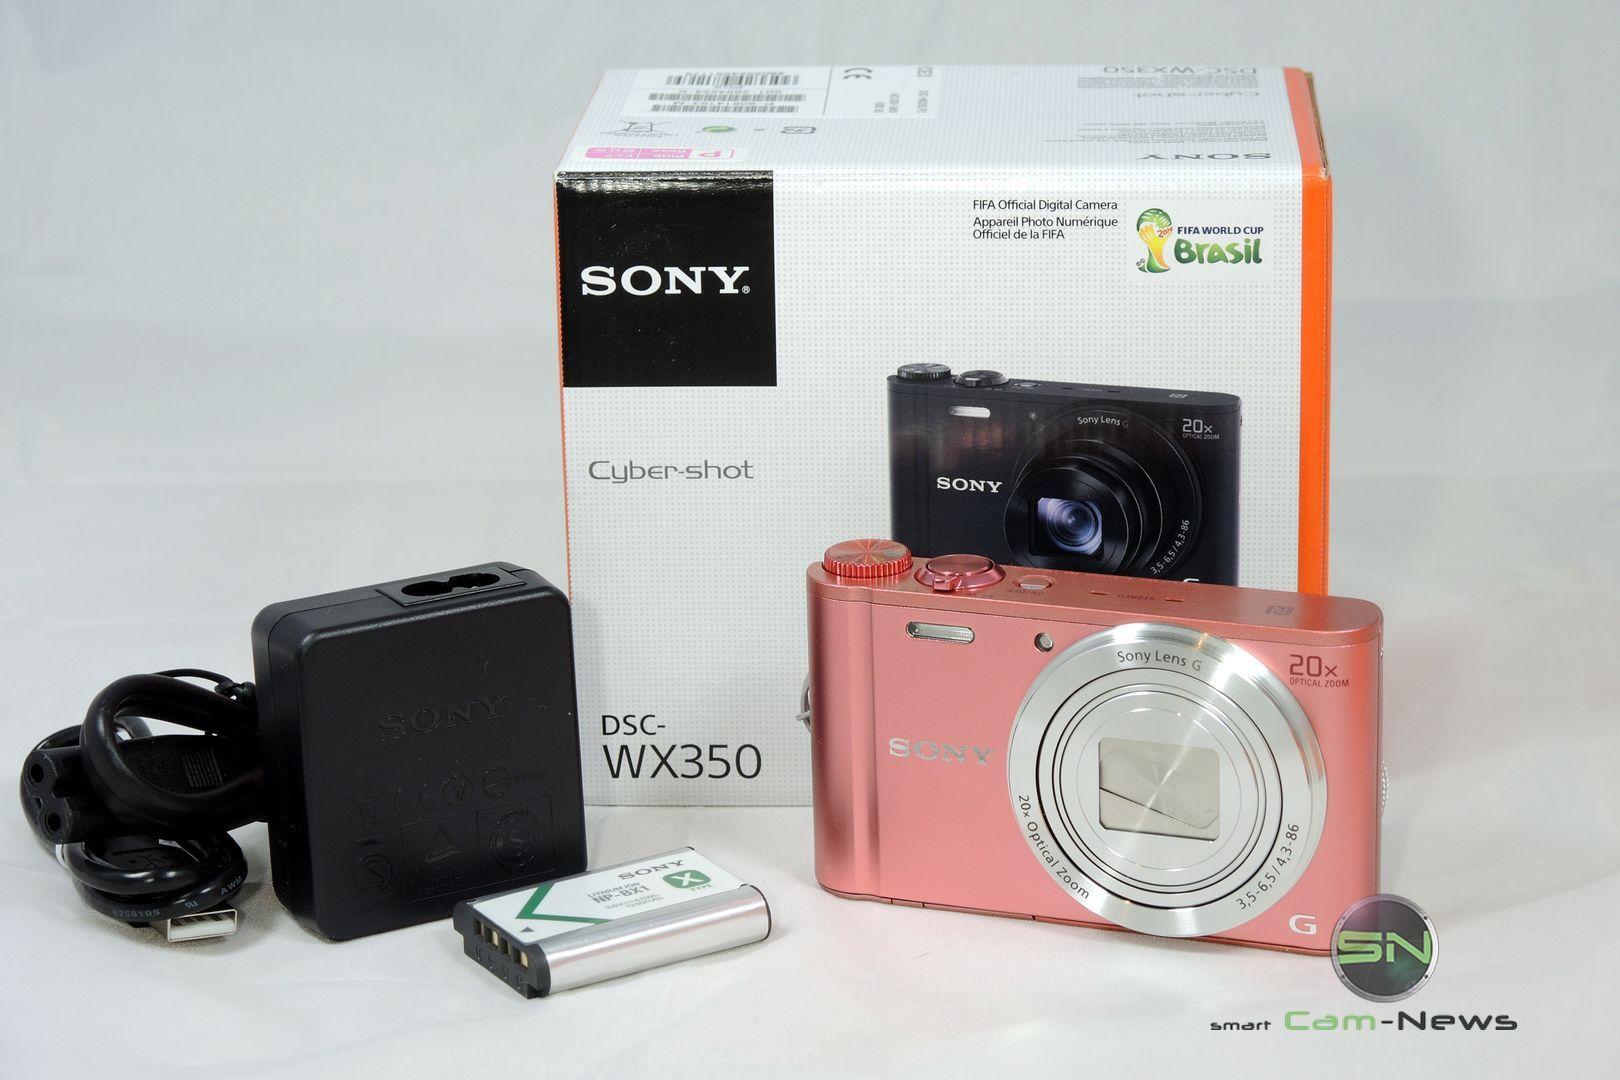 Unboxing - Sony WX350 - Pocket Kamera - SmartCamNews